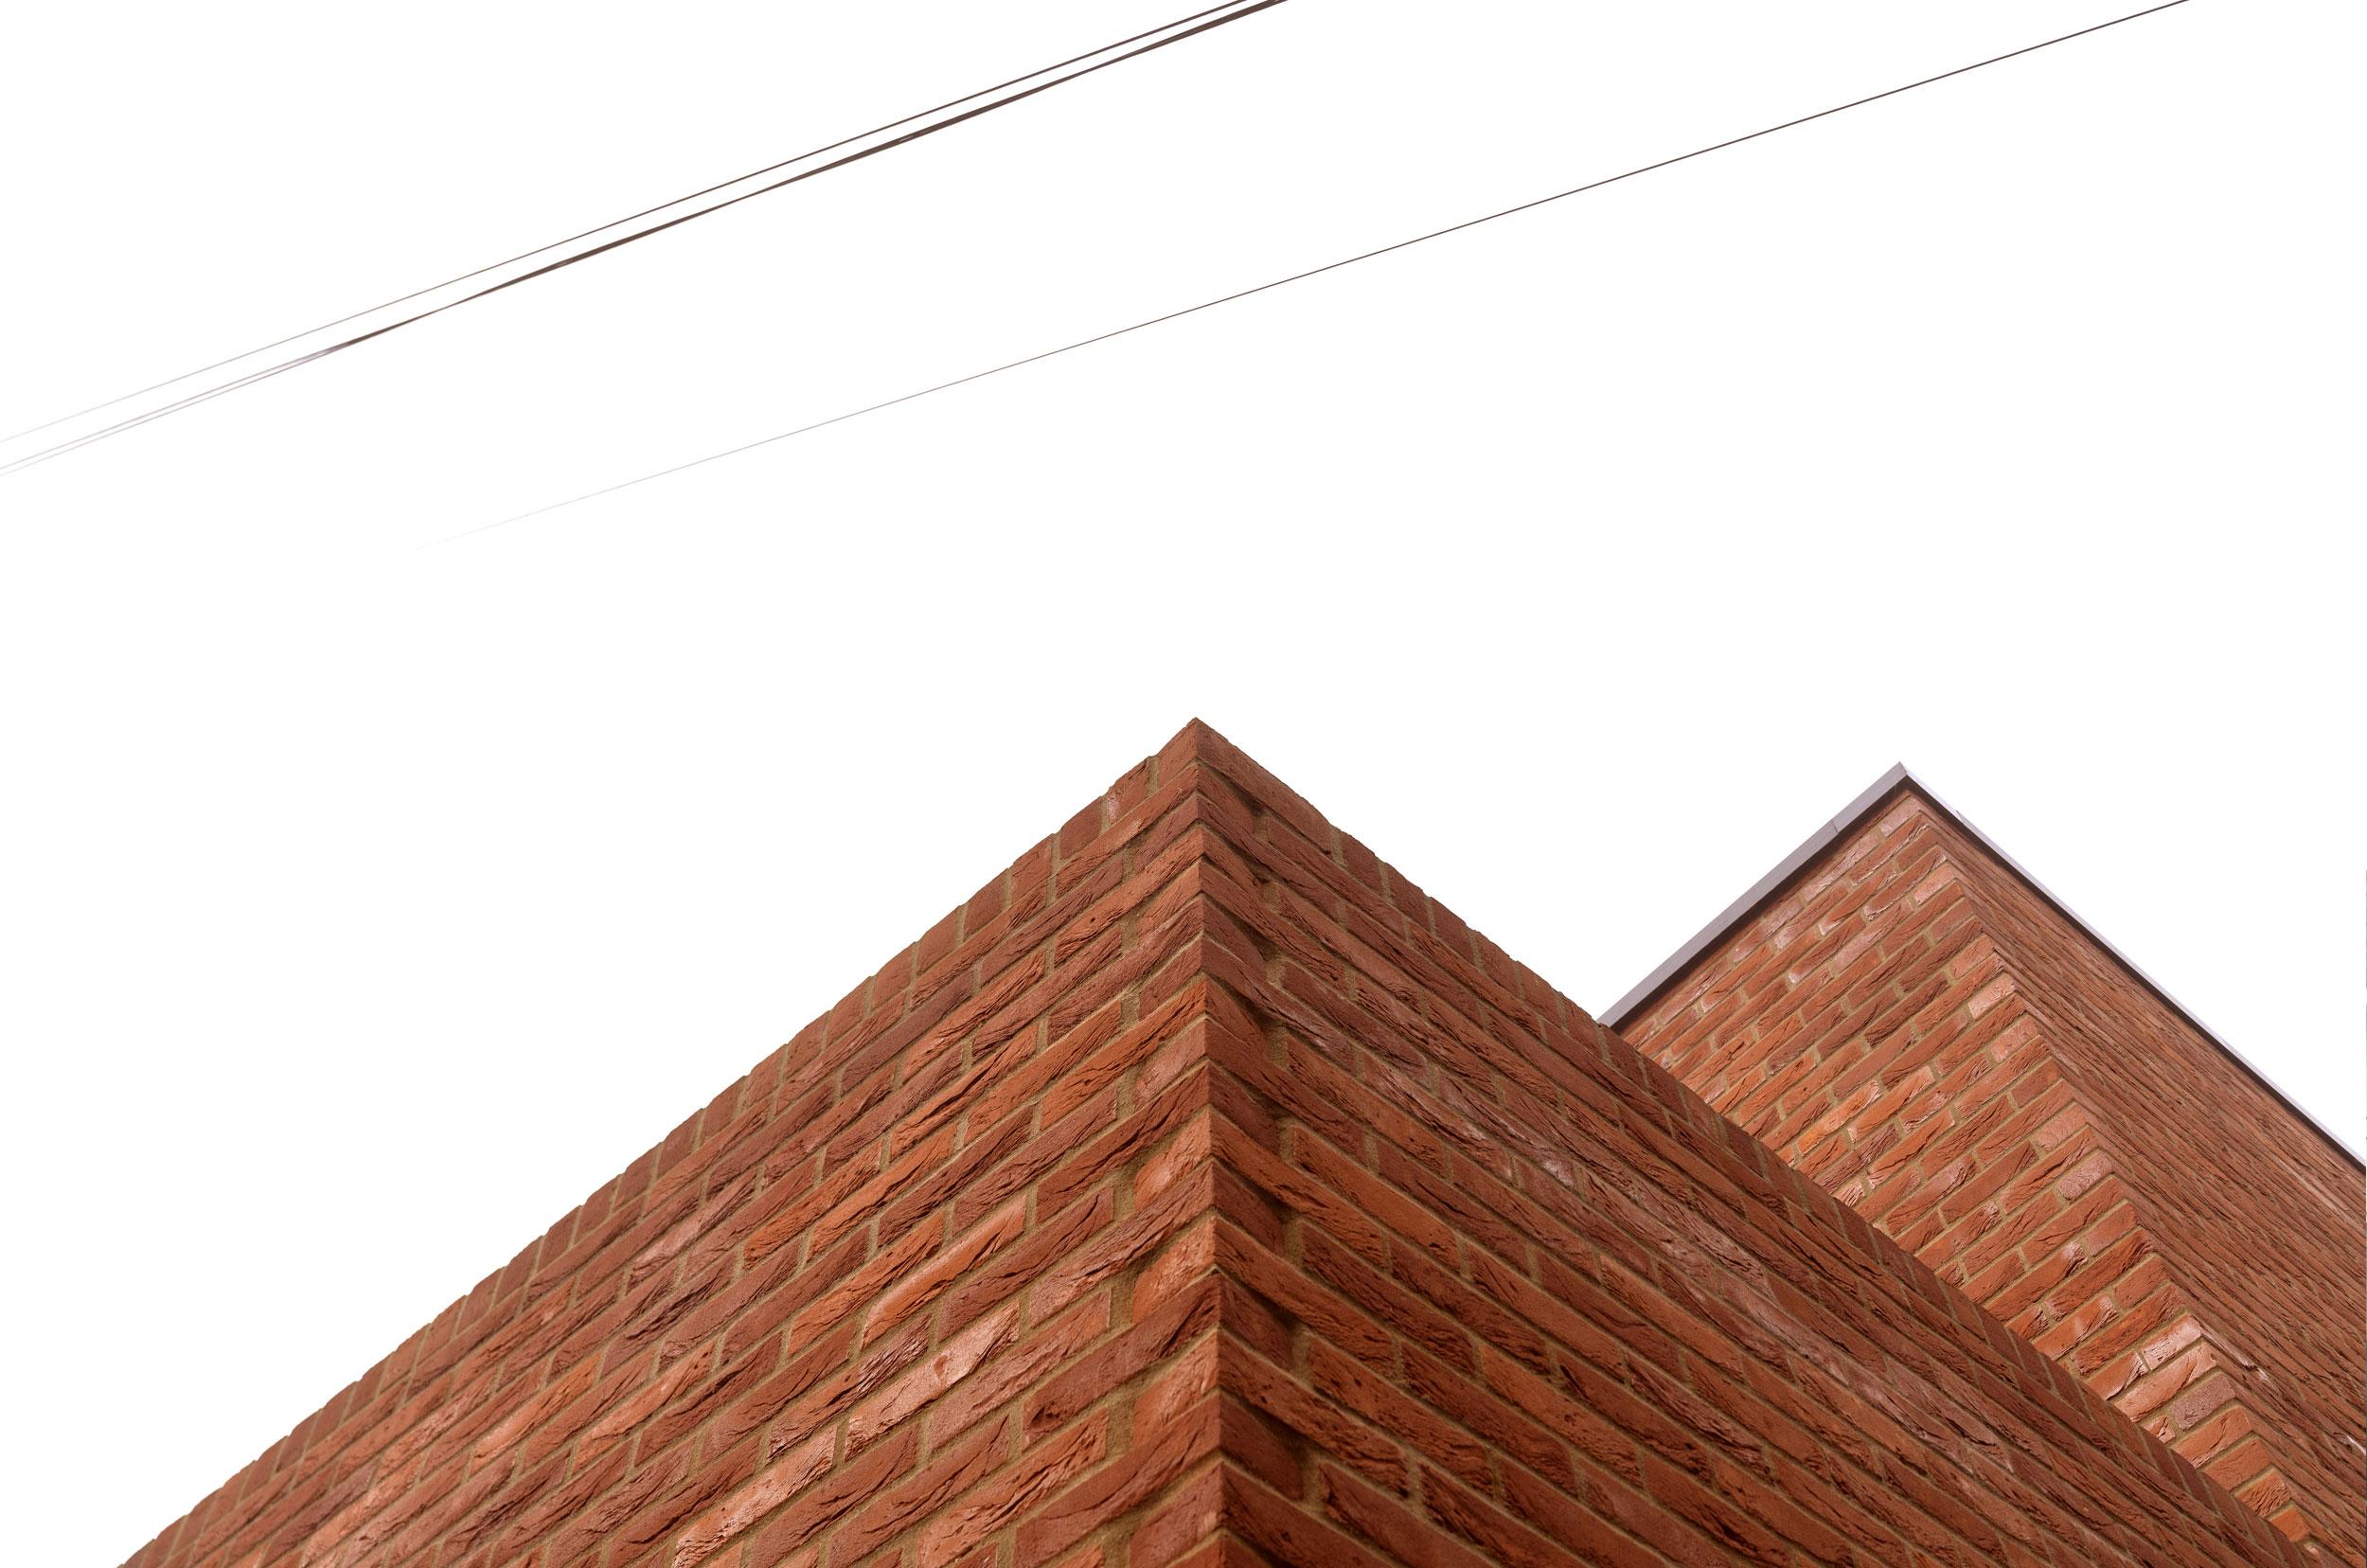 Hudson-Rose-Valley-Fiona-Burrage-exterior-Norwich-Photographer-Brick.jpg